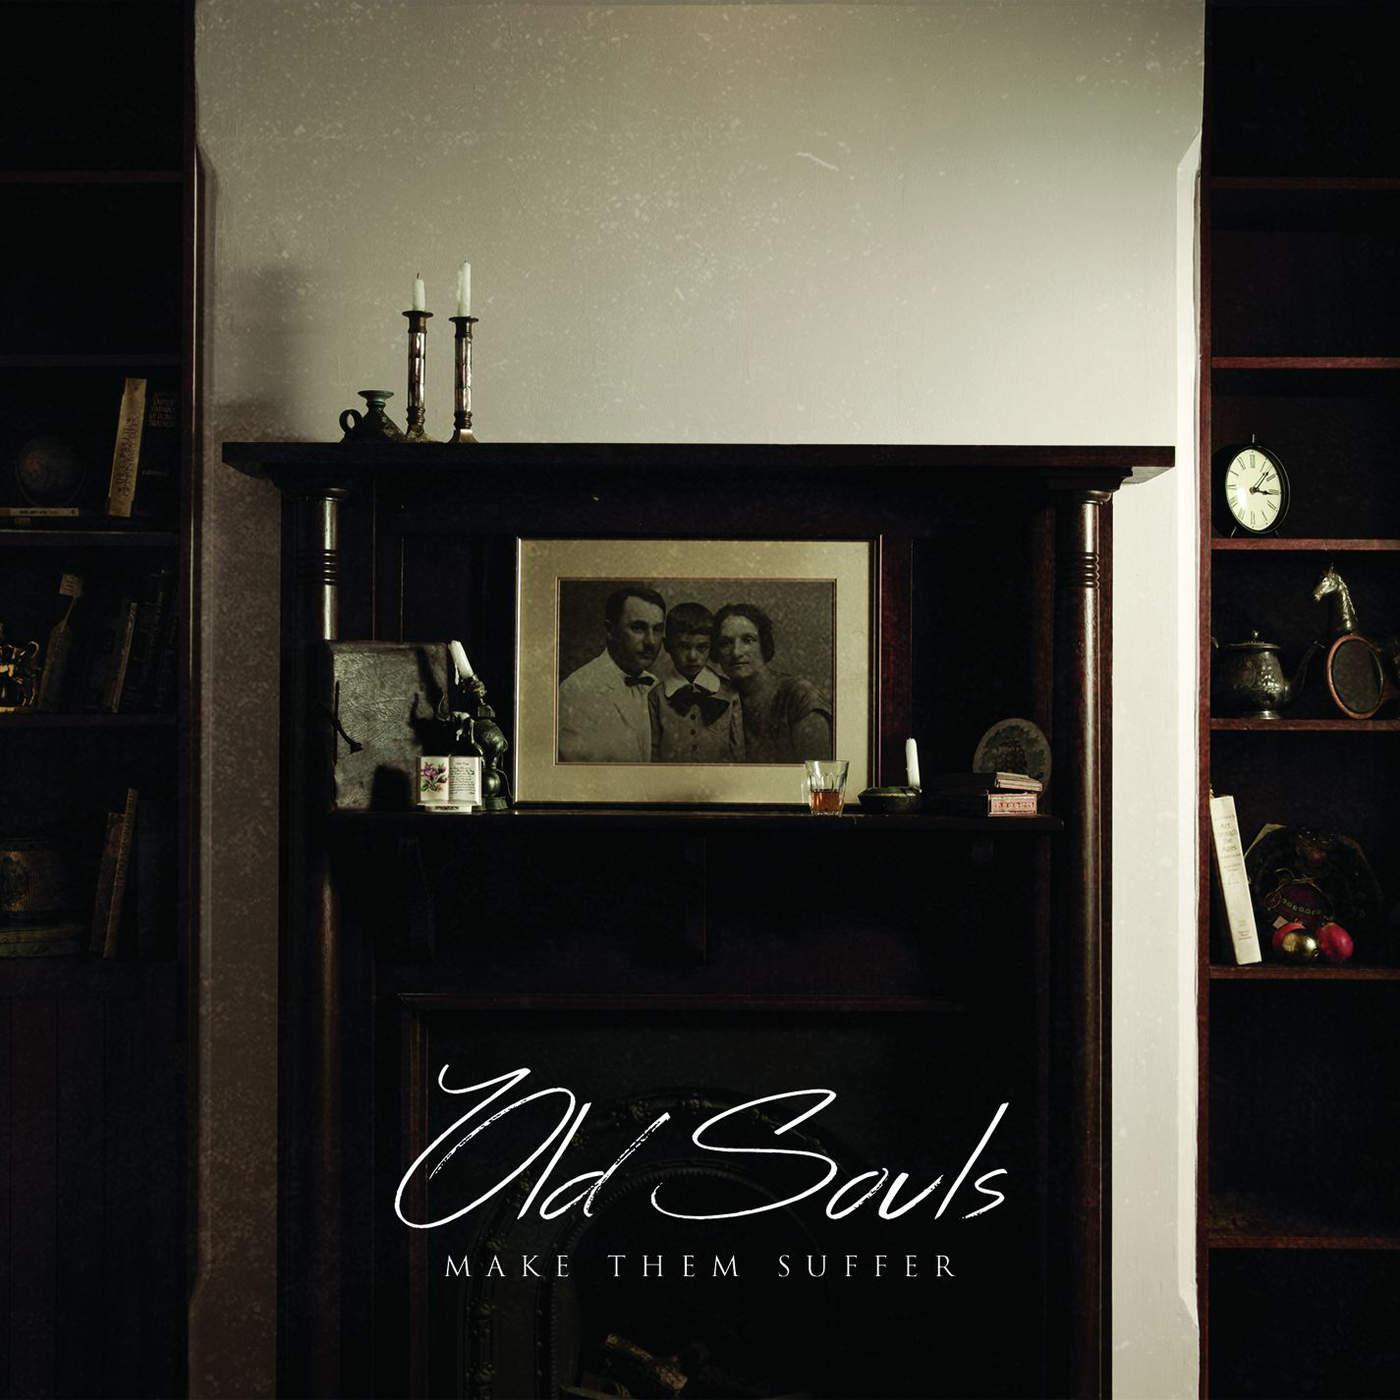 Make Them Suffer - Old Souls (2015)